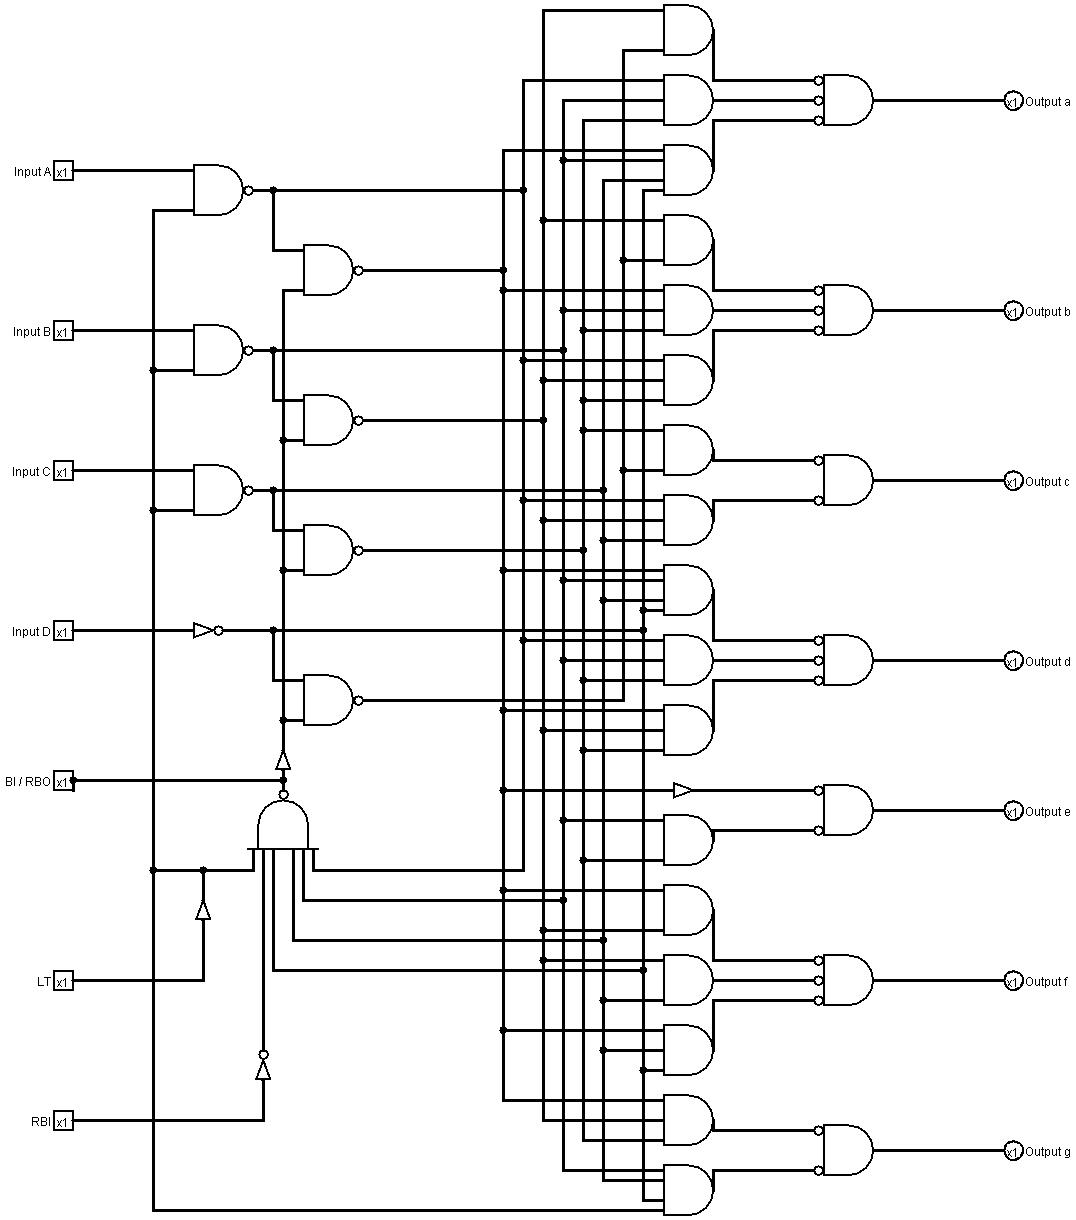 Segmenttobcd1 Basiccircuit Circuit Diagram Seekiccom